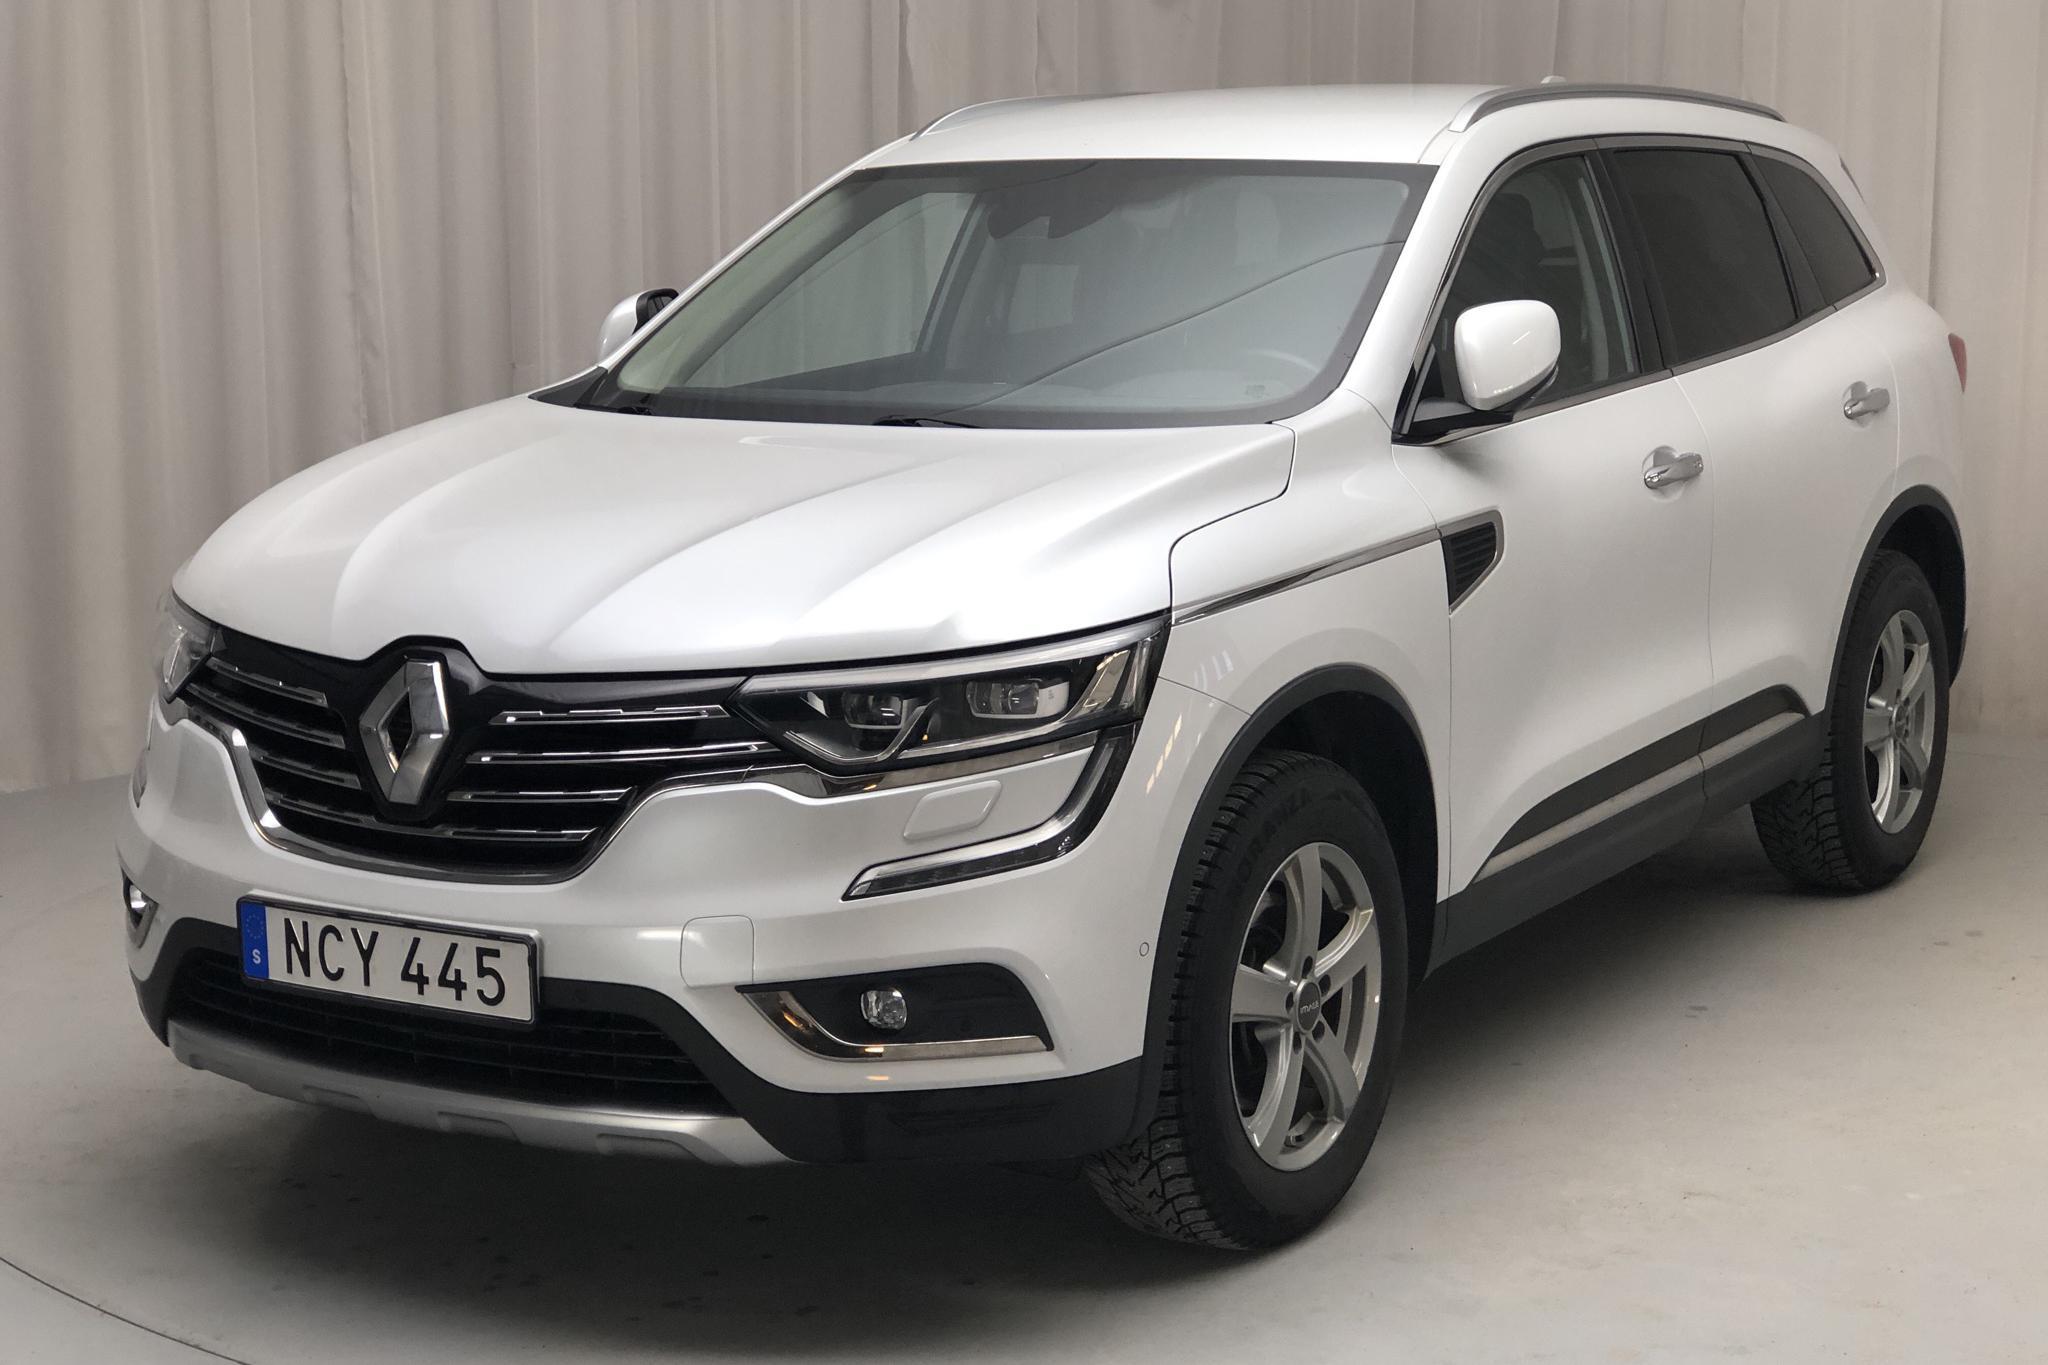 Renault Koleos 2.0 dCi 4X4 (177hk) - 73 800 km - Automatic - 2018